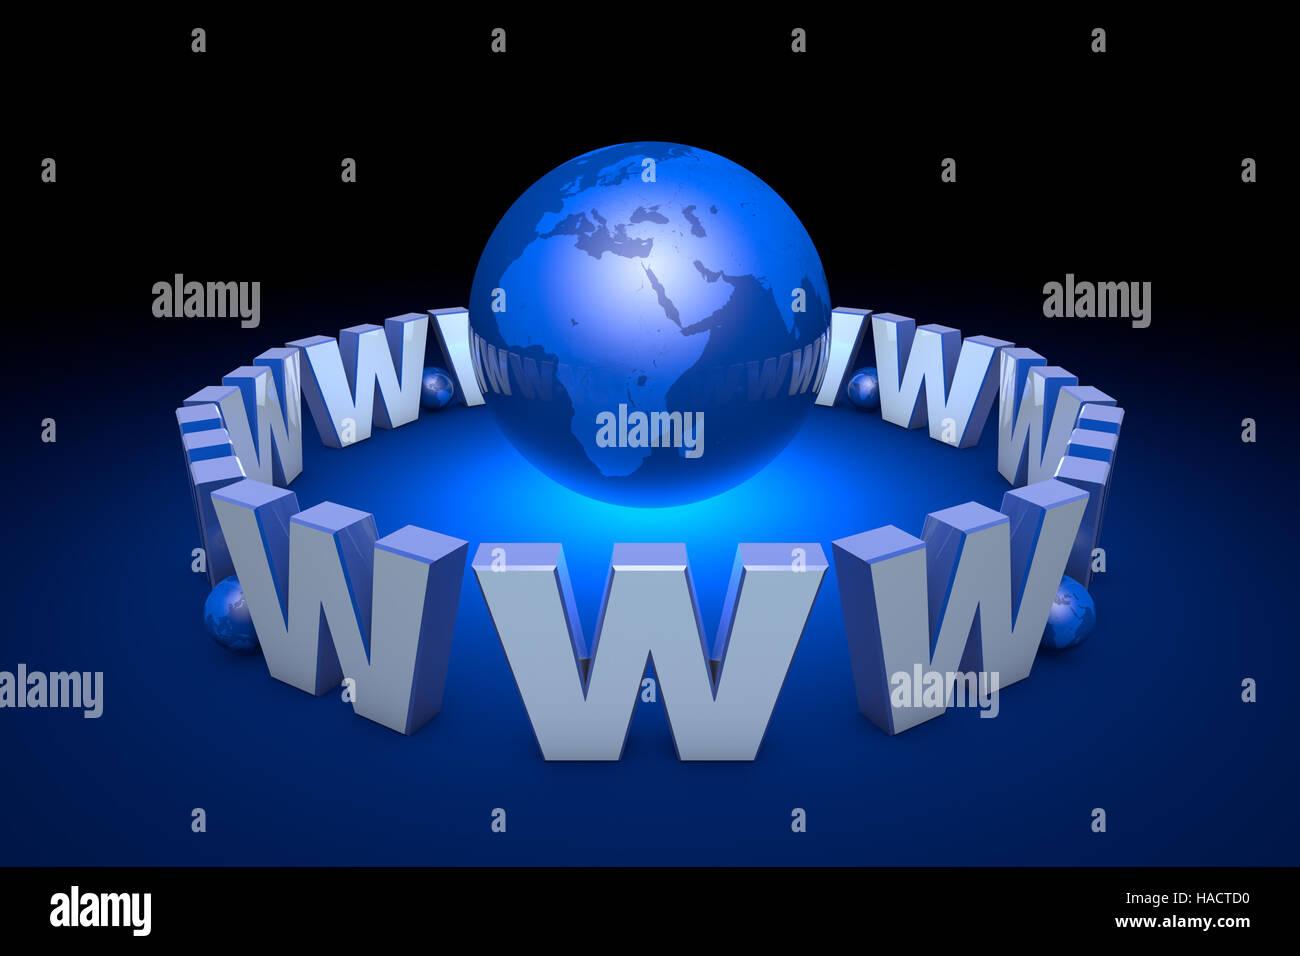 Globalization. International communication system. New information technologies. Internet addiction (image metaphor). - Stock Image